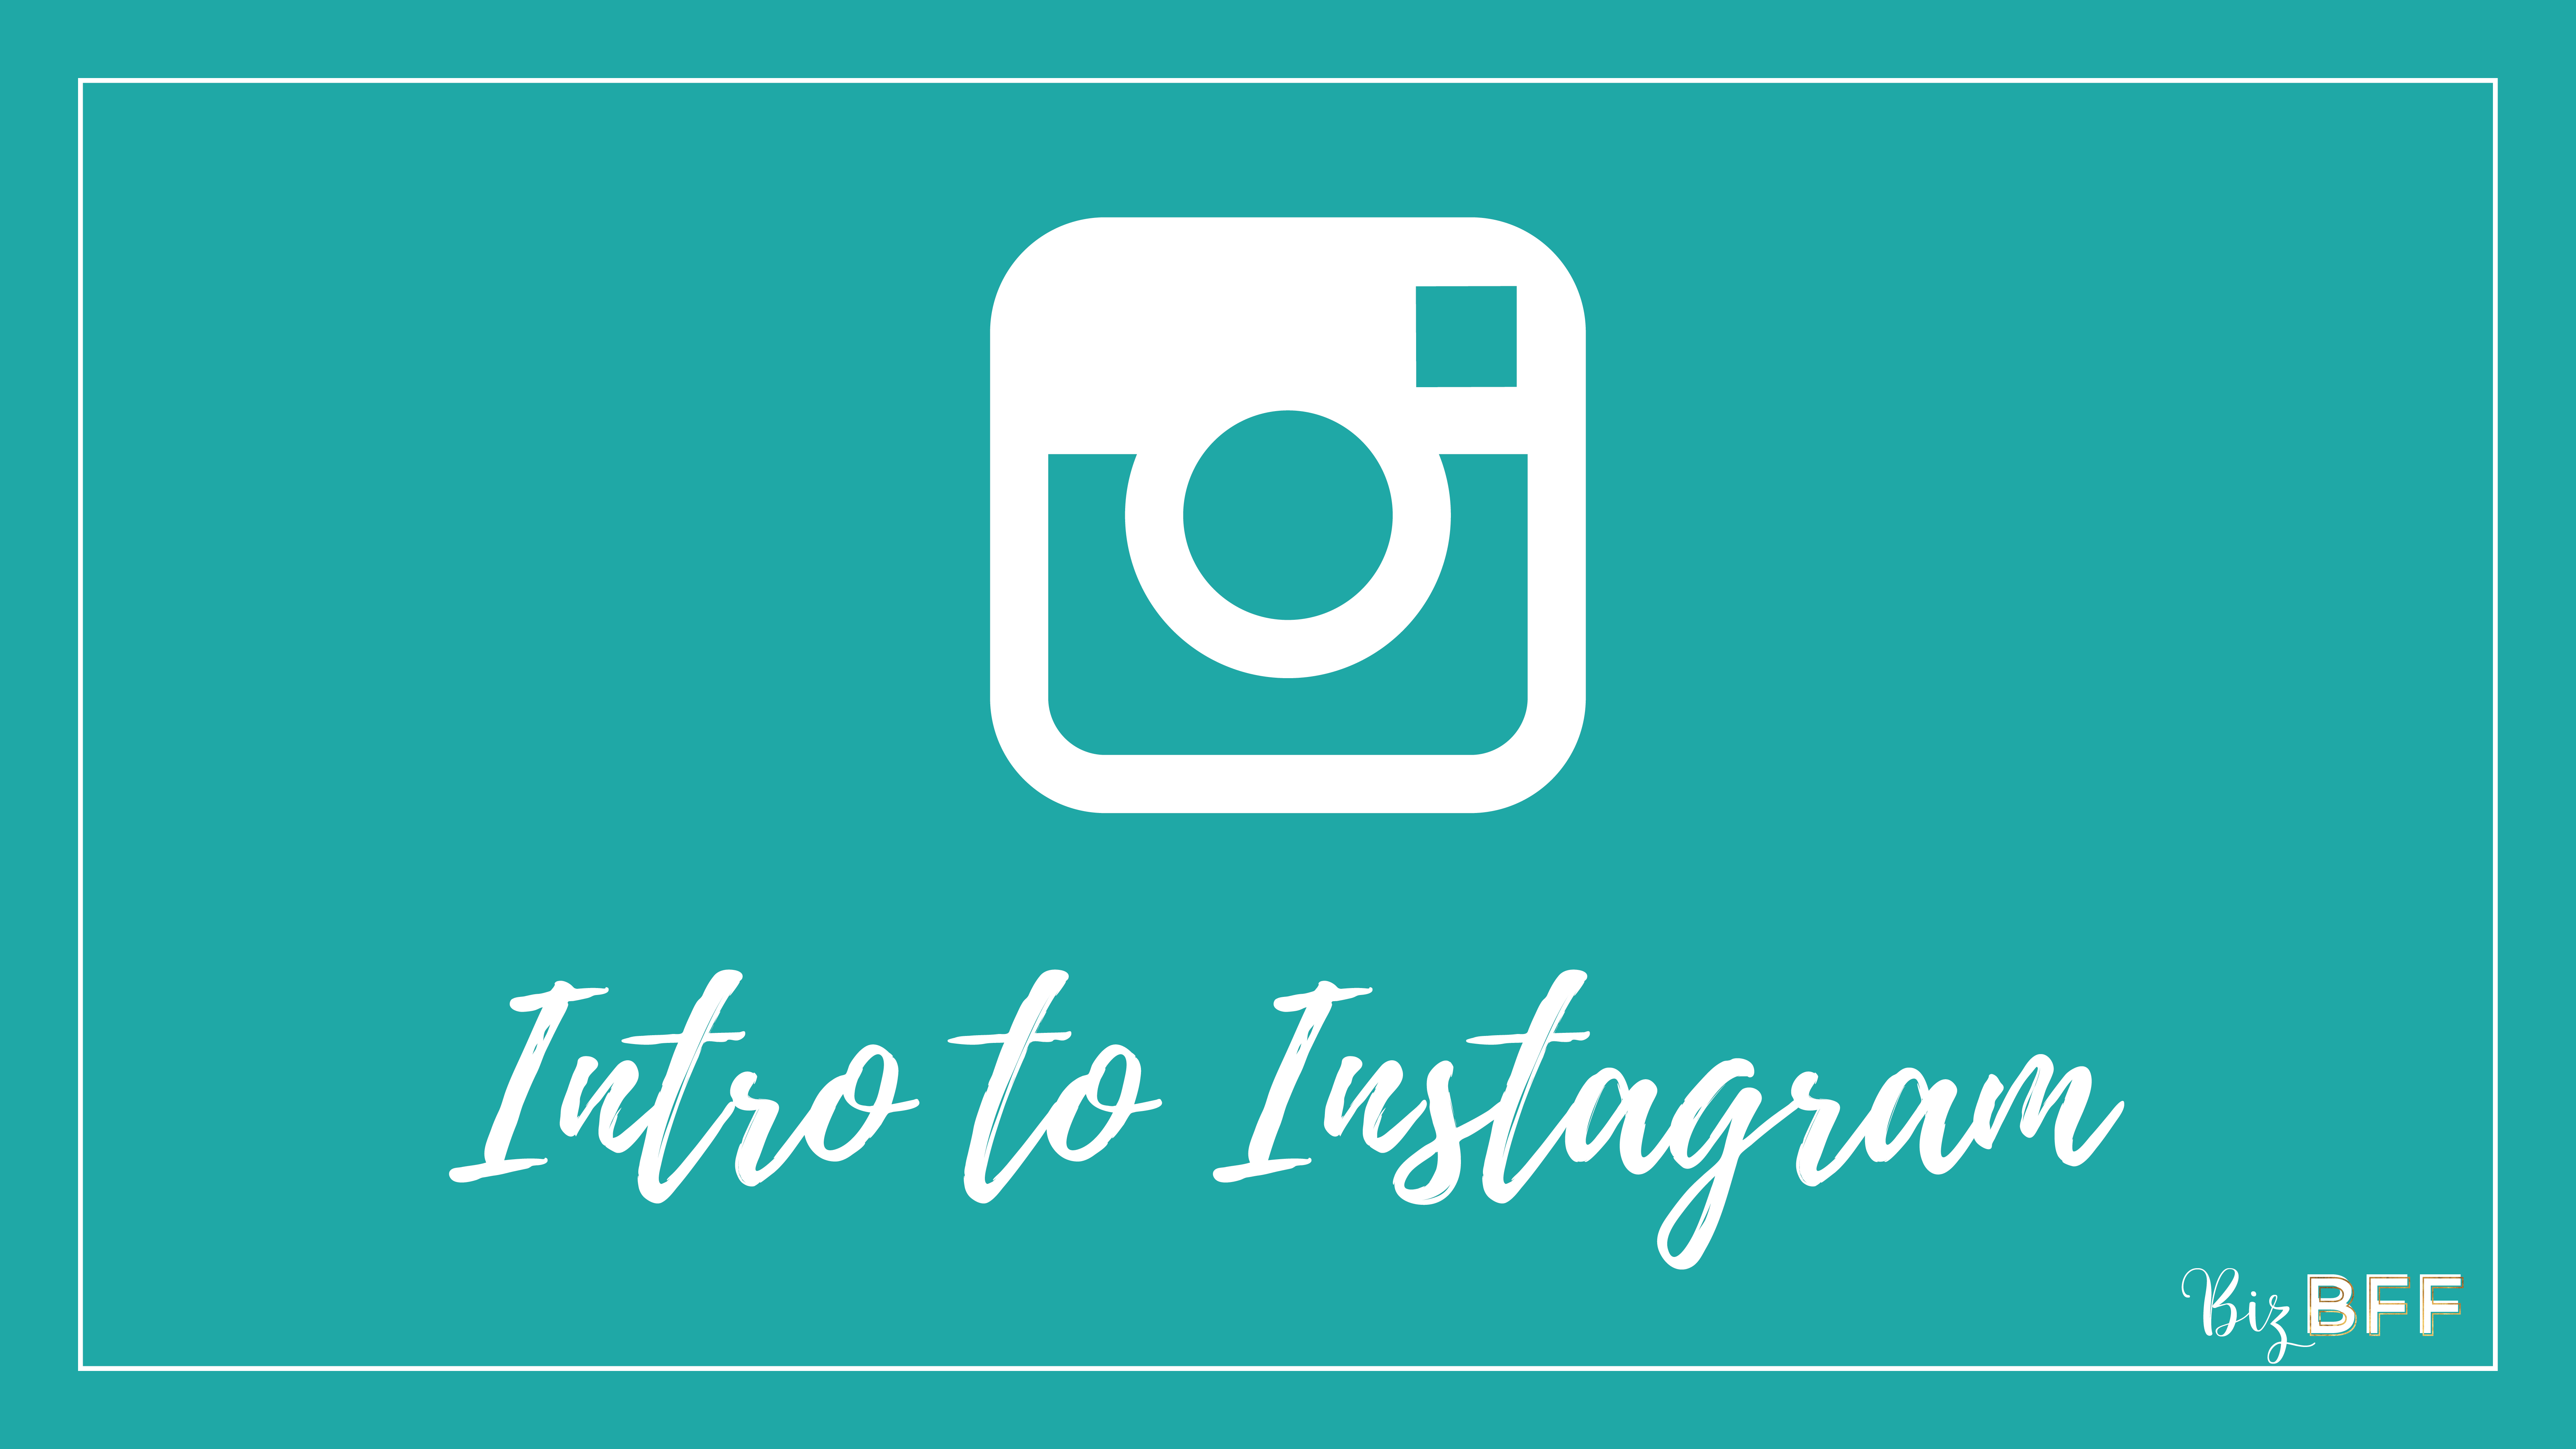 Intro to Instagram Course by Biz BFF